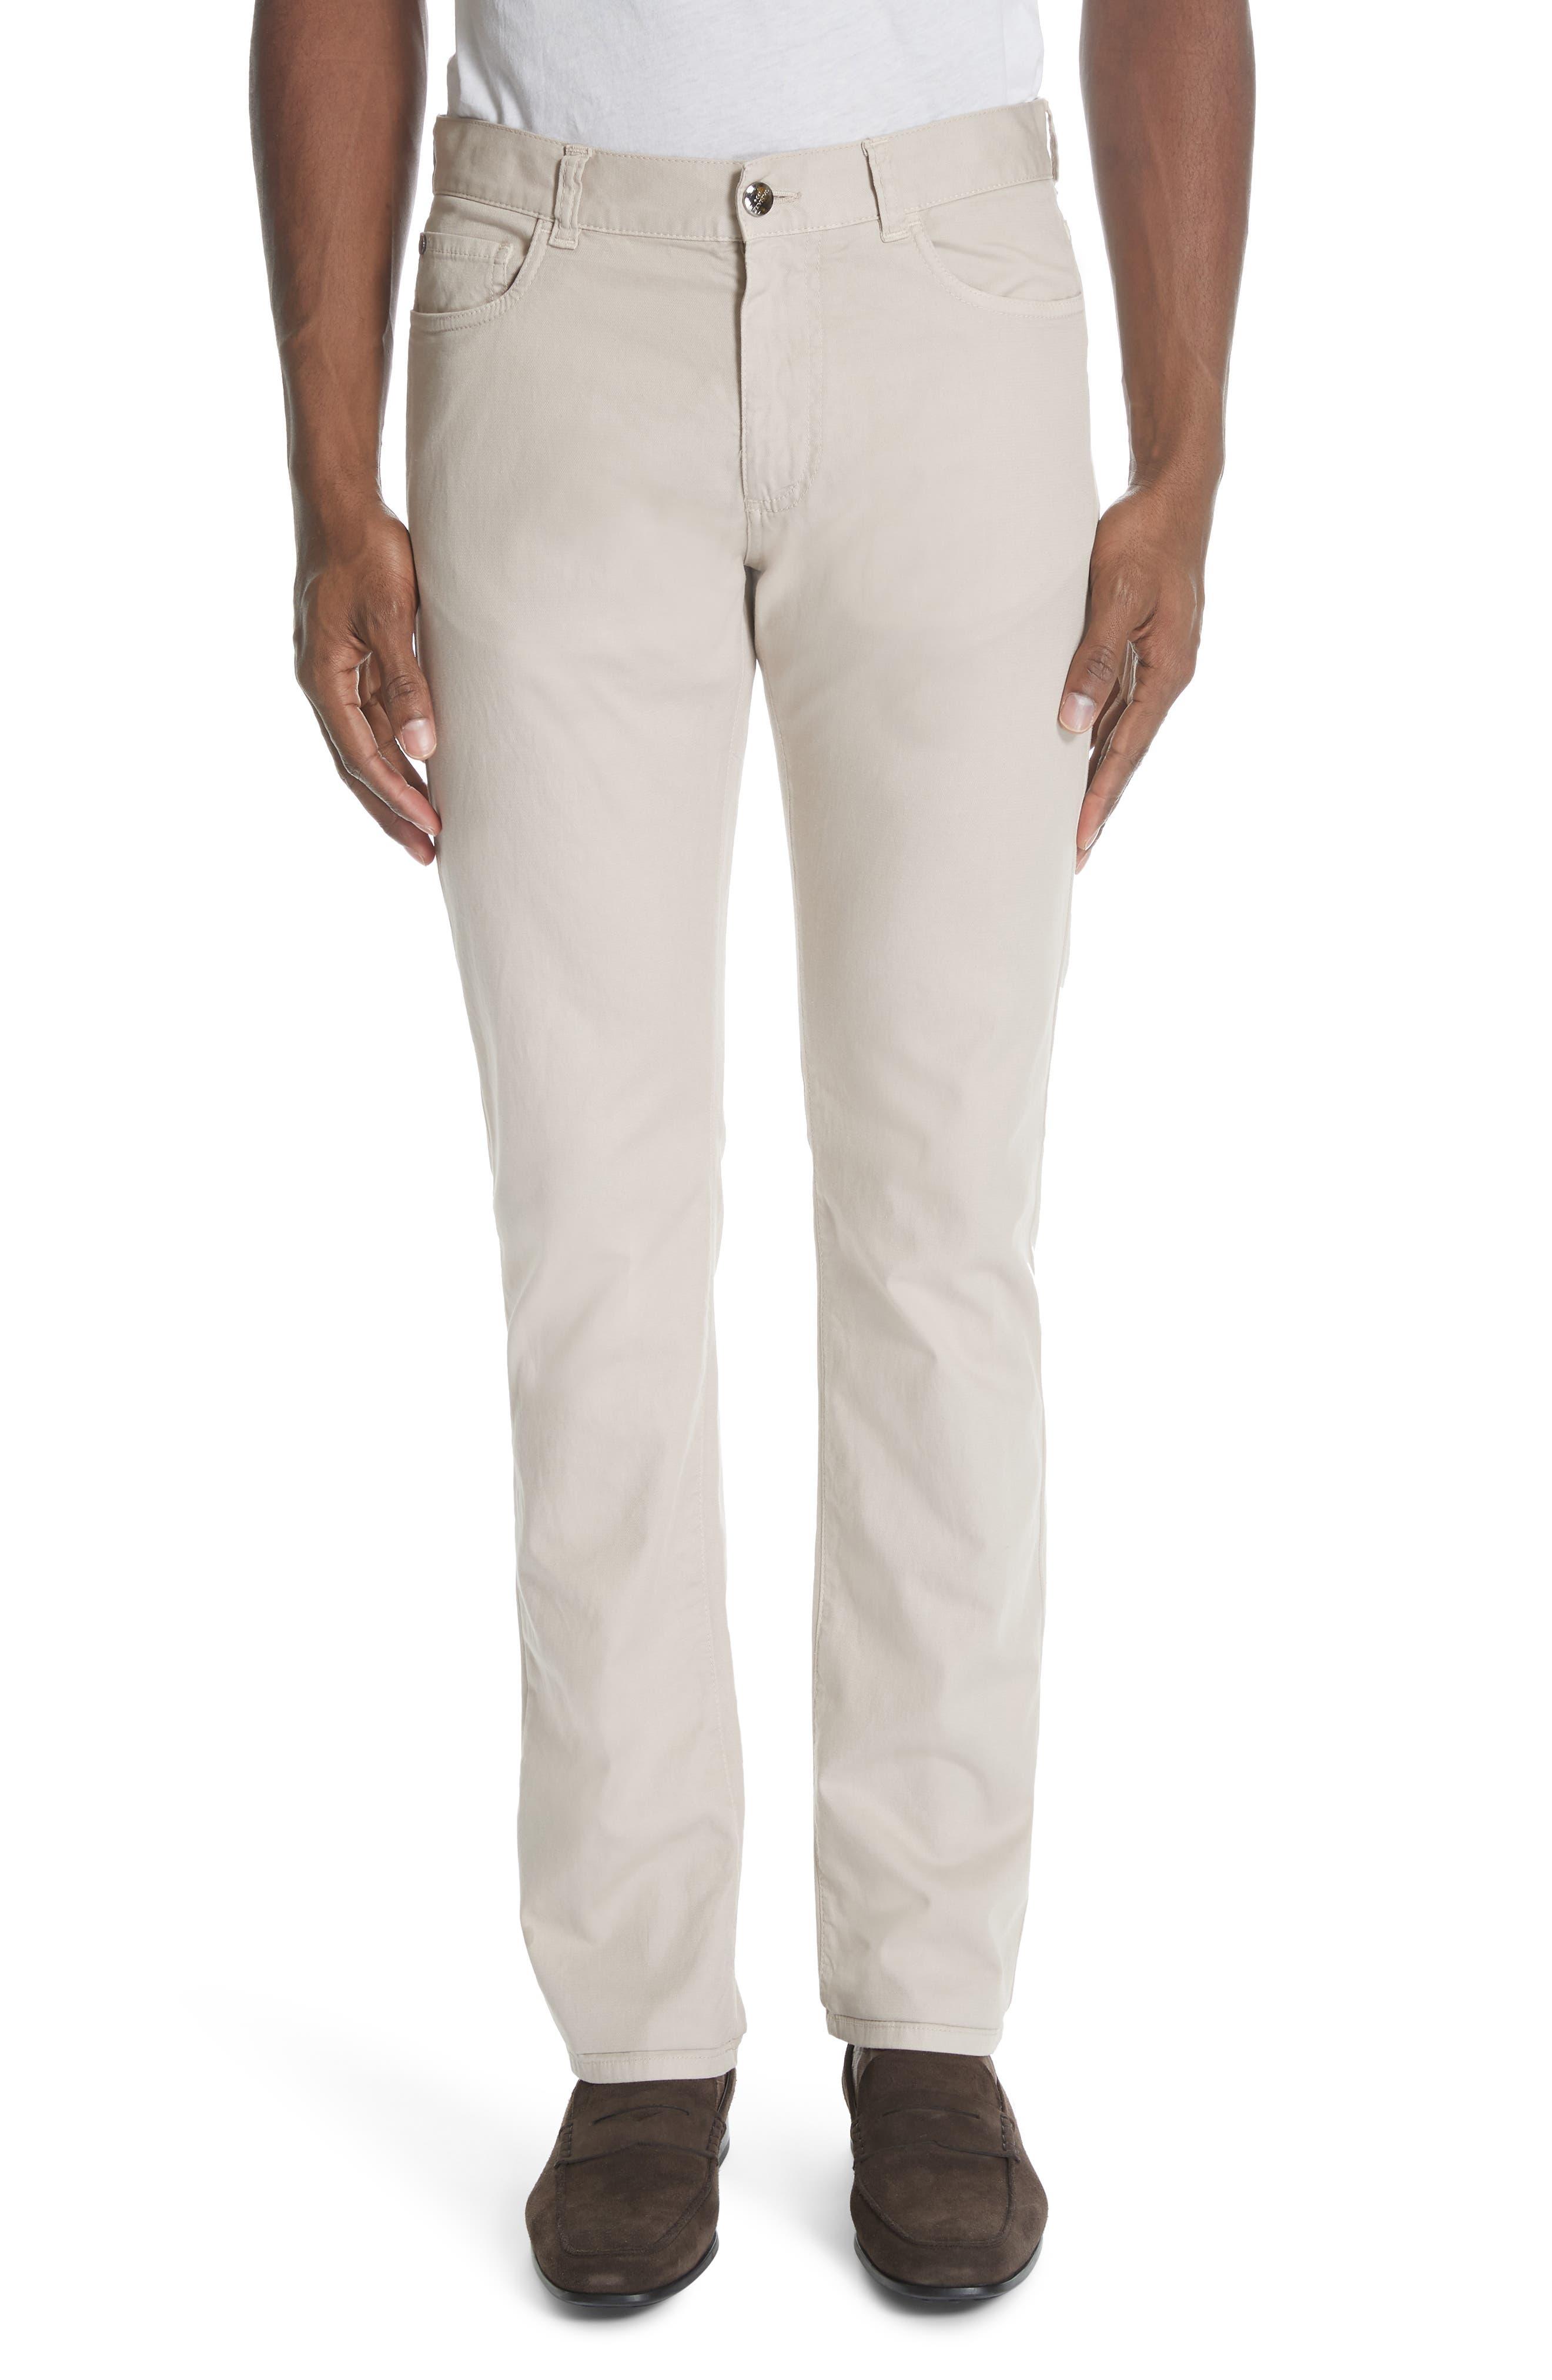 CANALI, Stretch Cotton Five Pocket Trousers, Main thumbnail 1, color, BEIGE